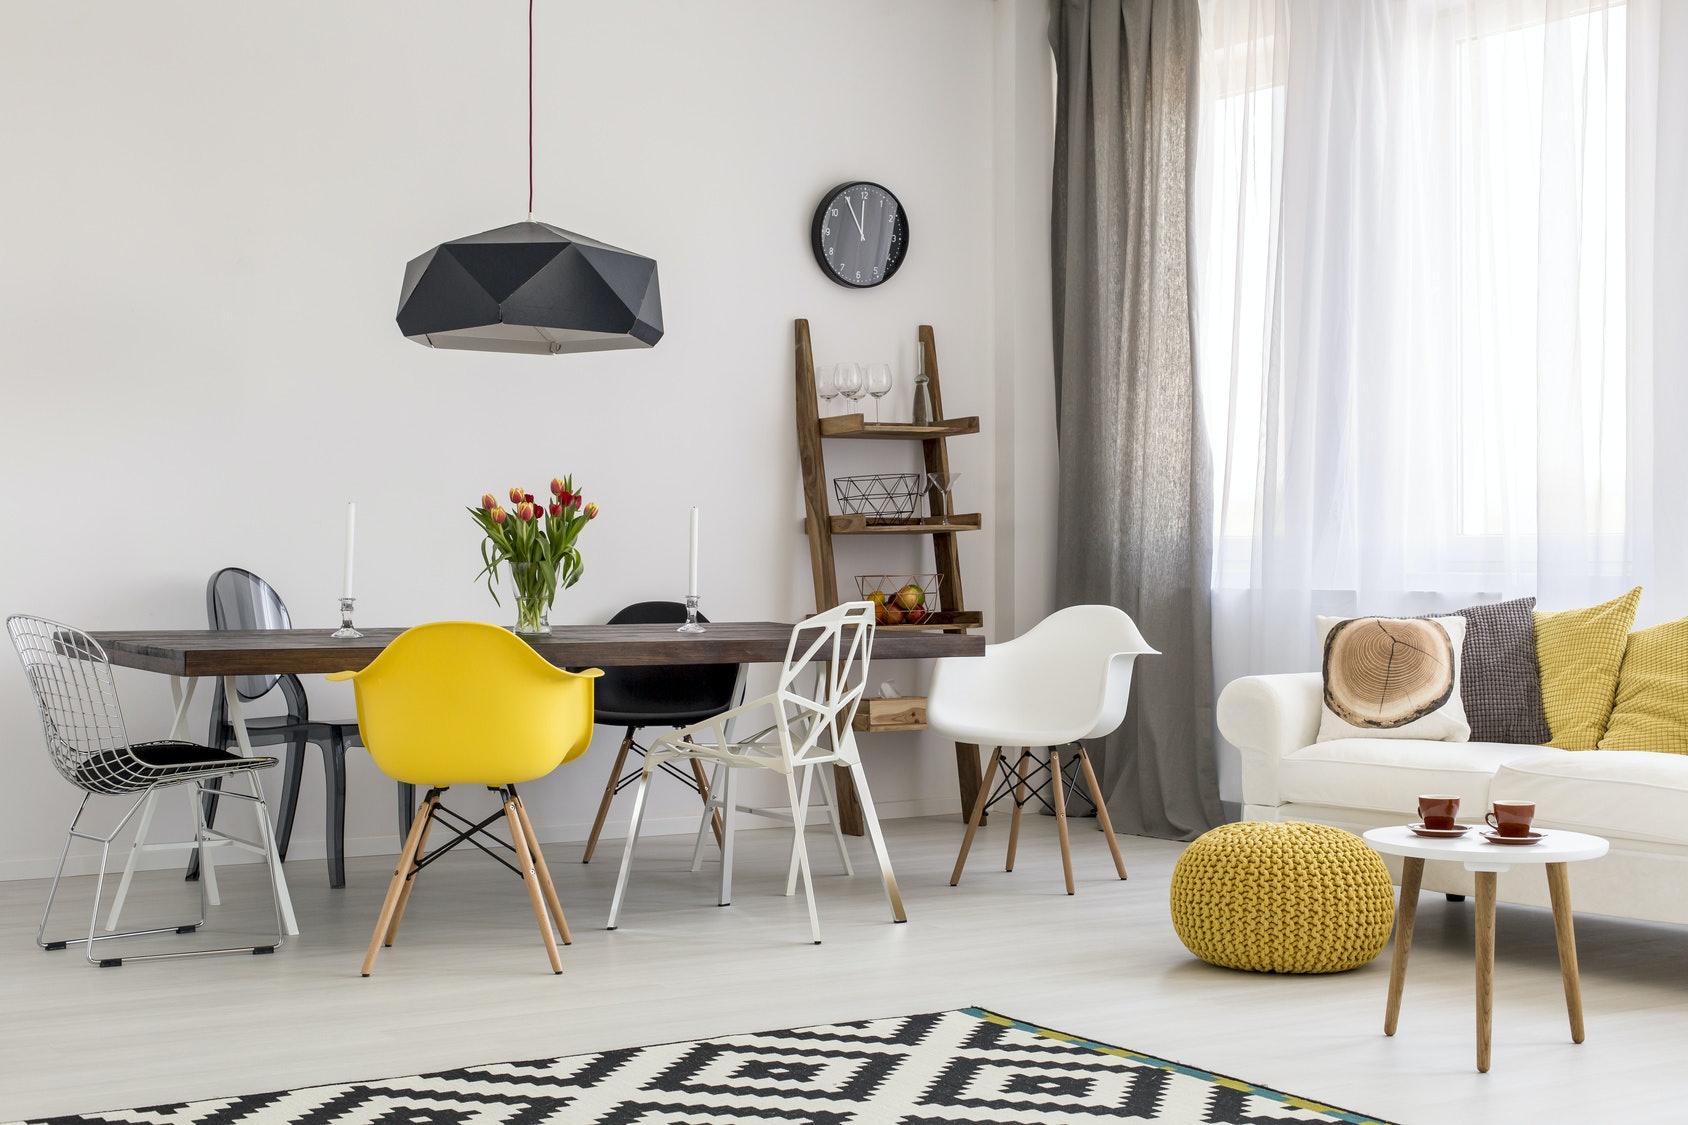 Discount Home Decor Stores Online Part - 17: Best Cheap Online Furniture U0026 Home Decor To Shop Now